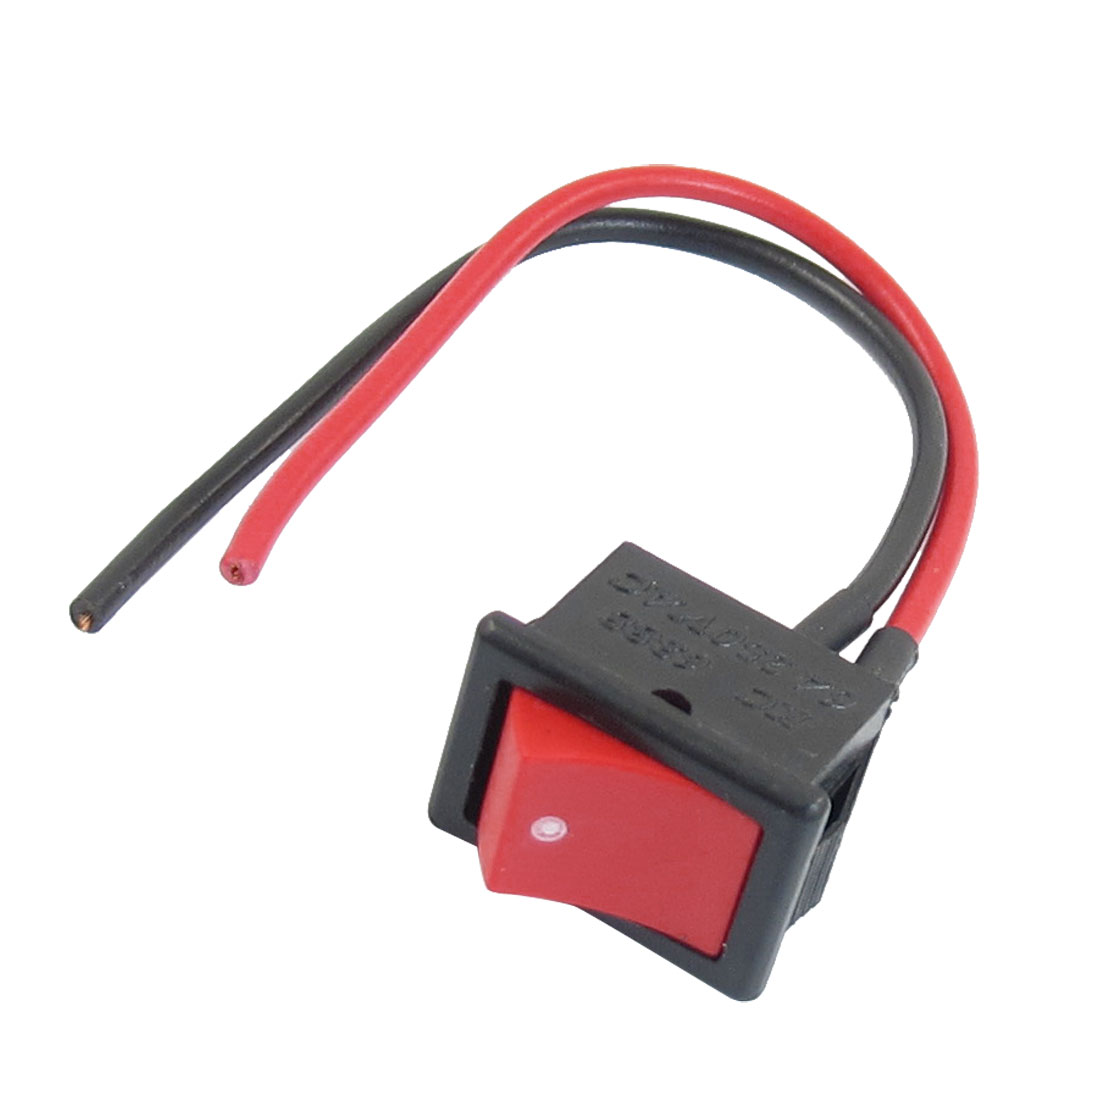 AC 250V 6A 2 SPST On/Off Mini Snap In Boat Rocker Switch Black Red w Wire Lead